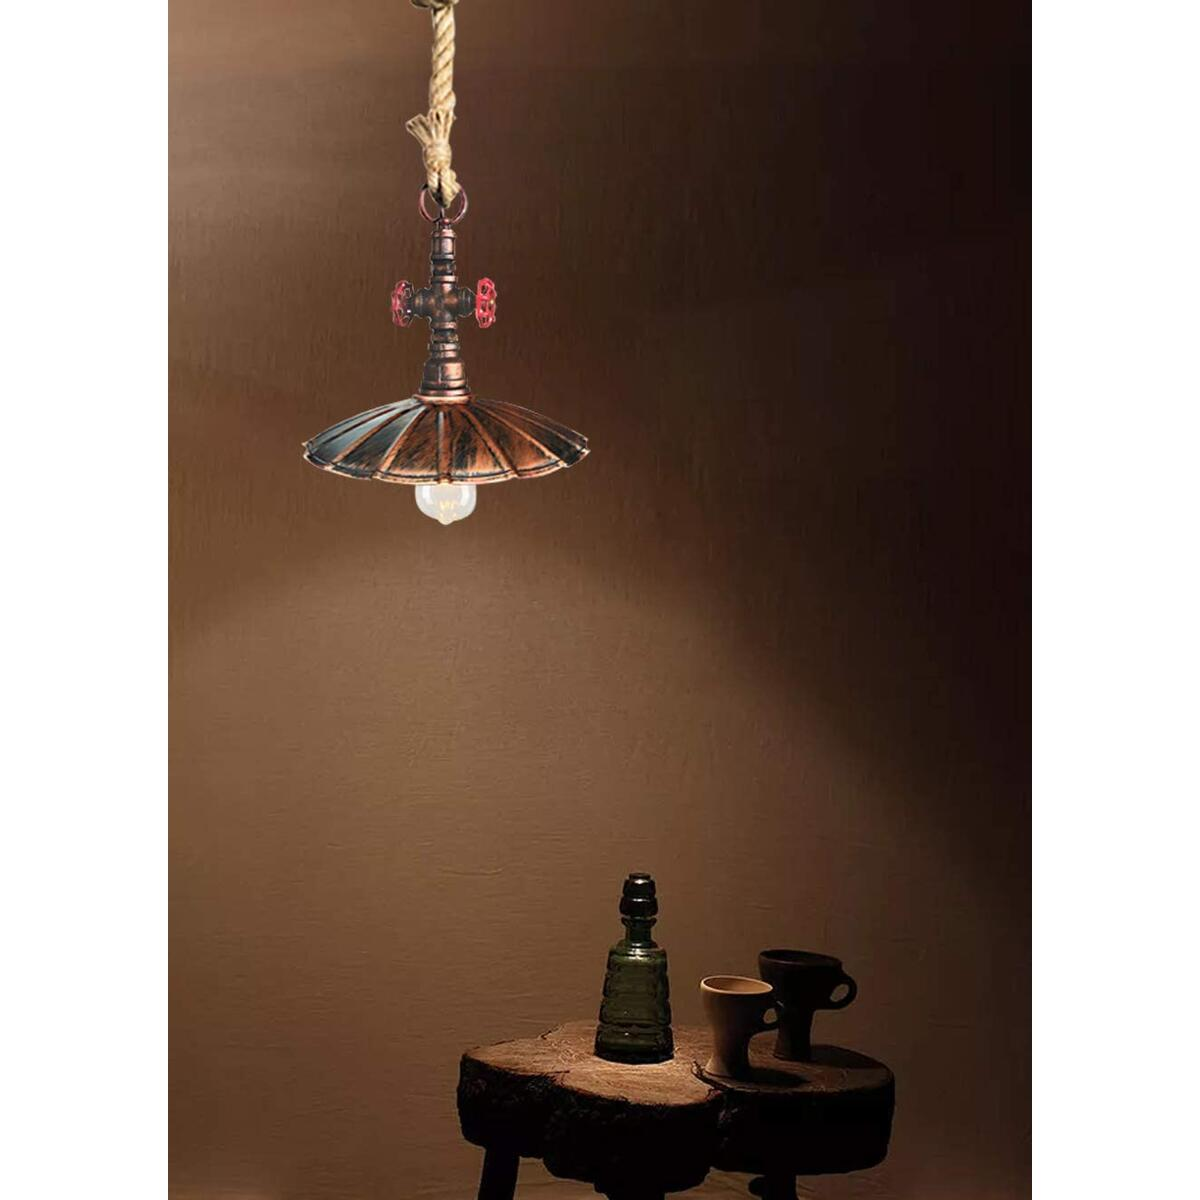 Vintage Pipe Pendant Light, 12